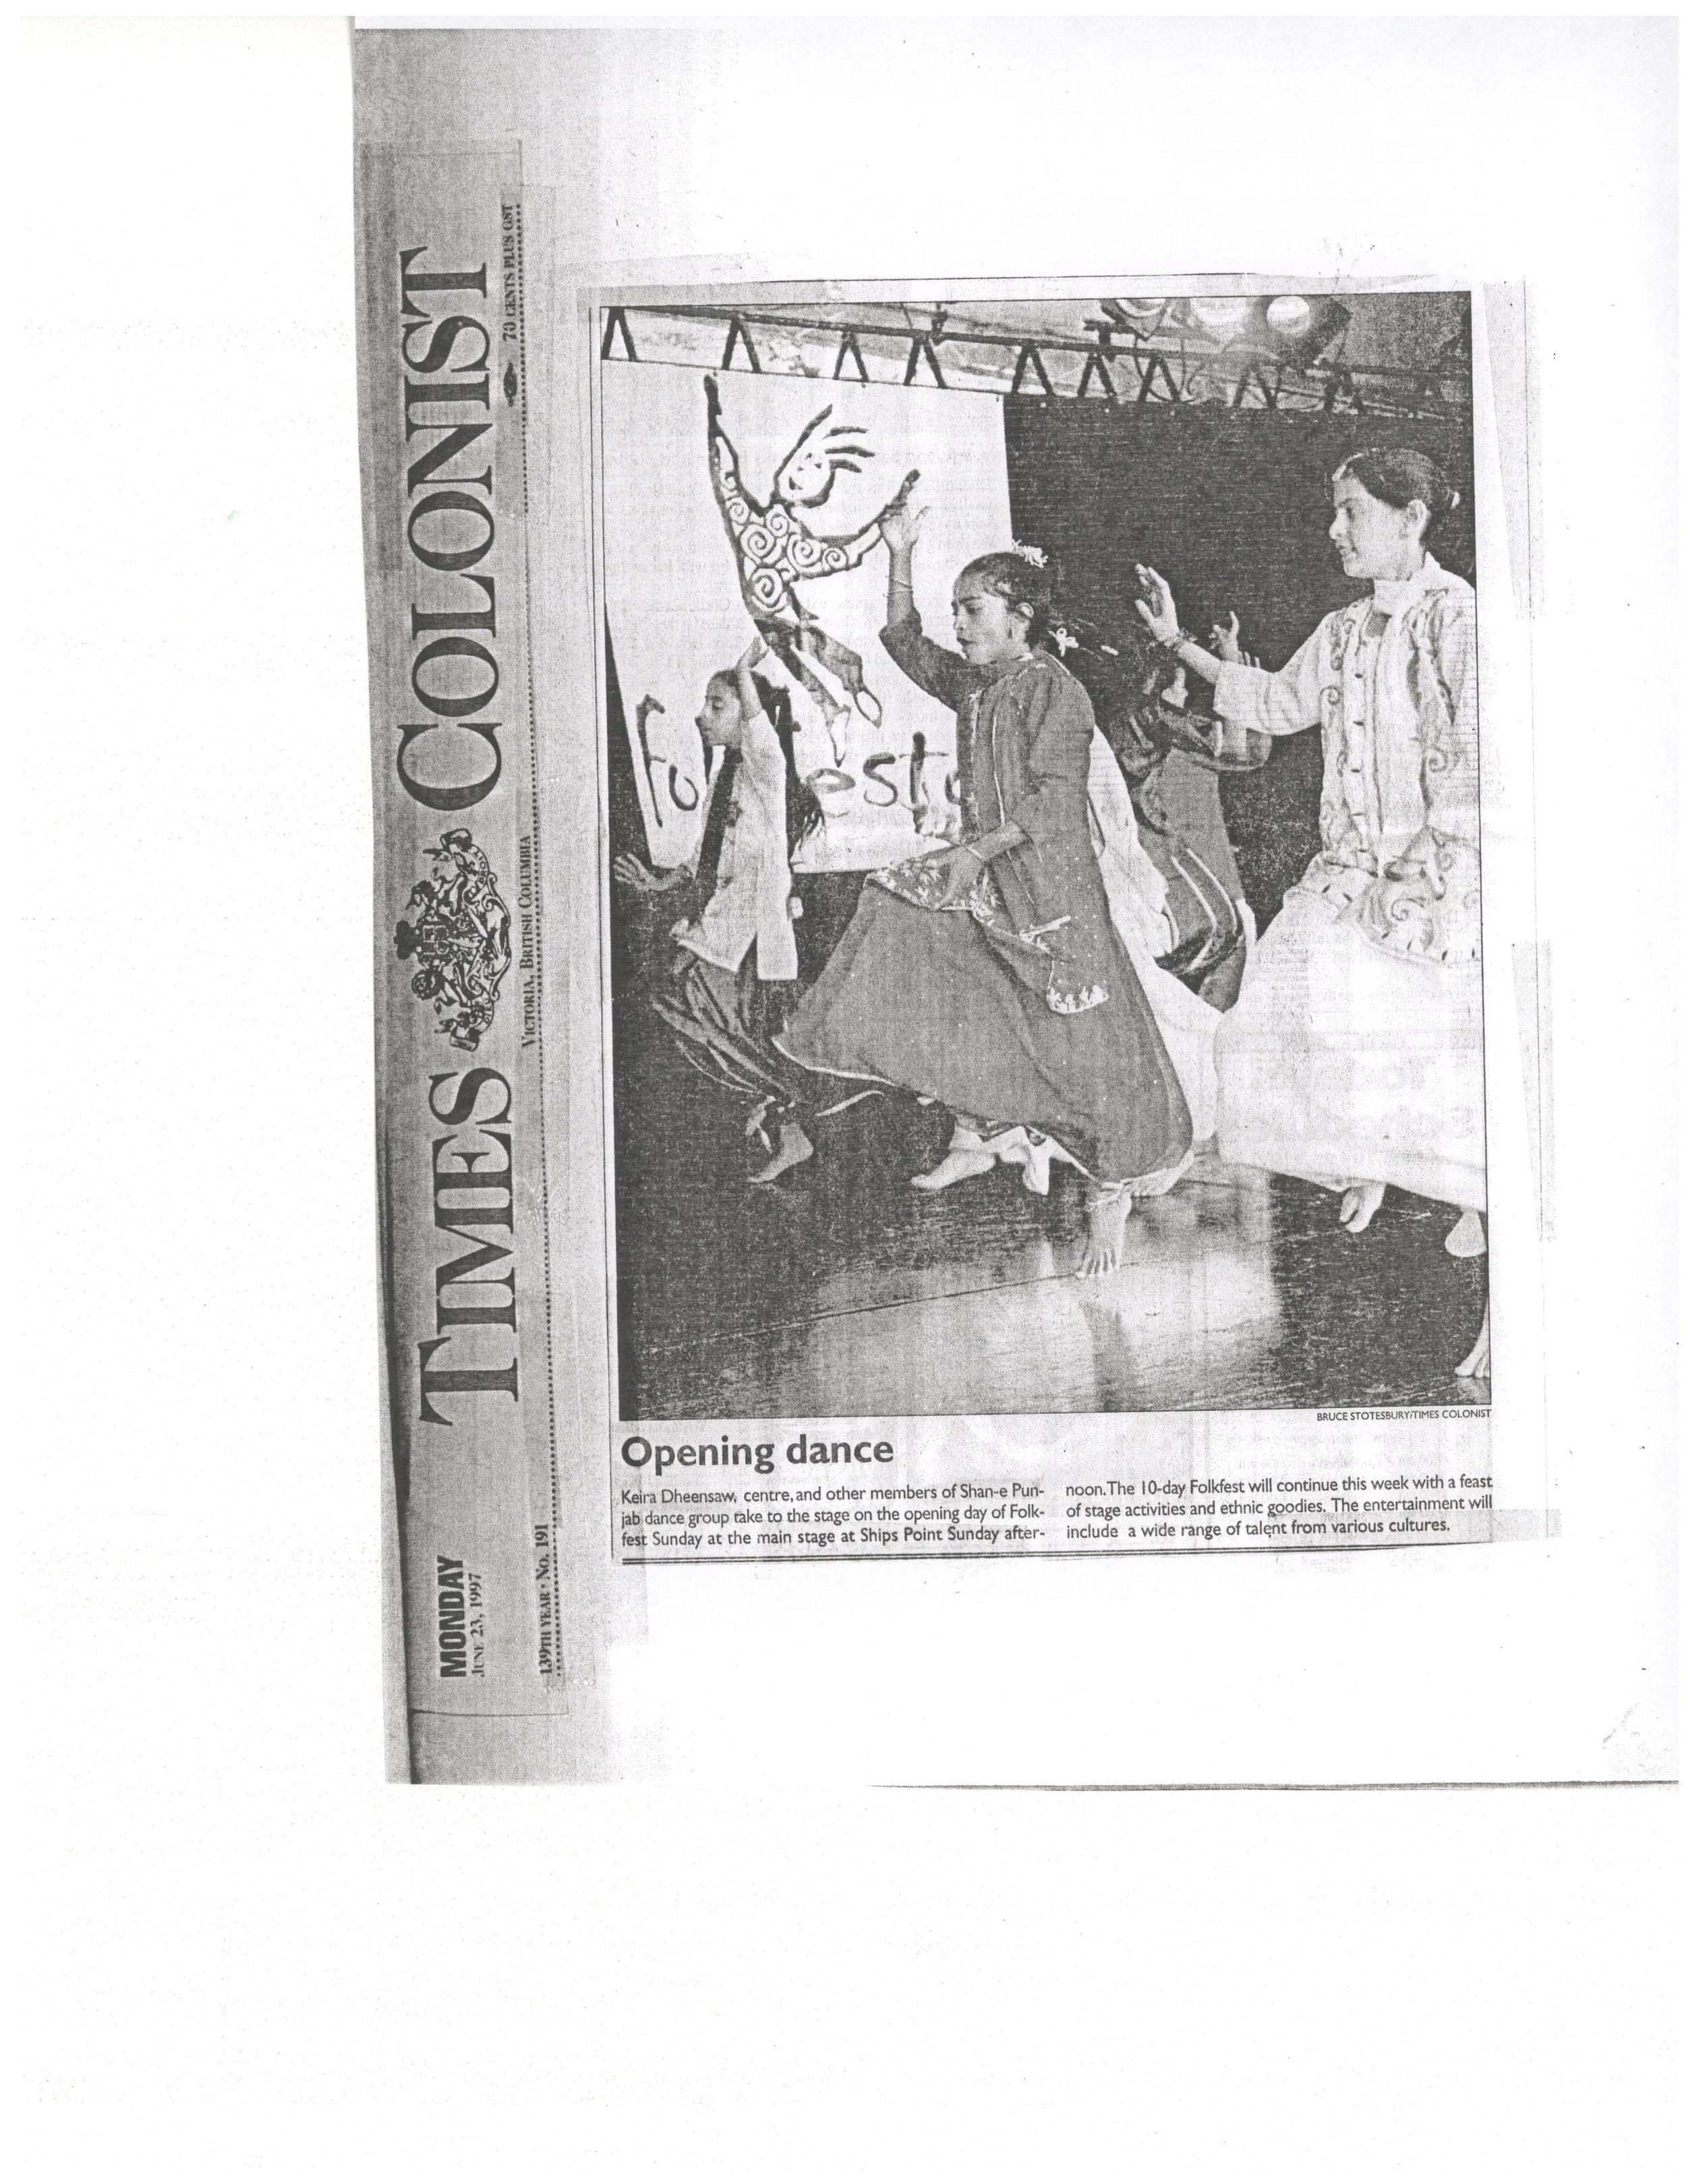 1997_opening_dance.jpg